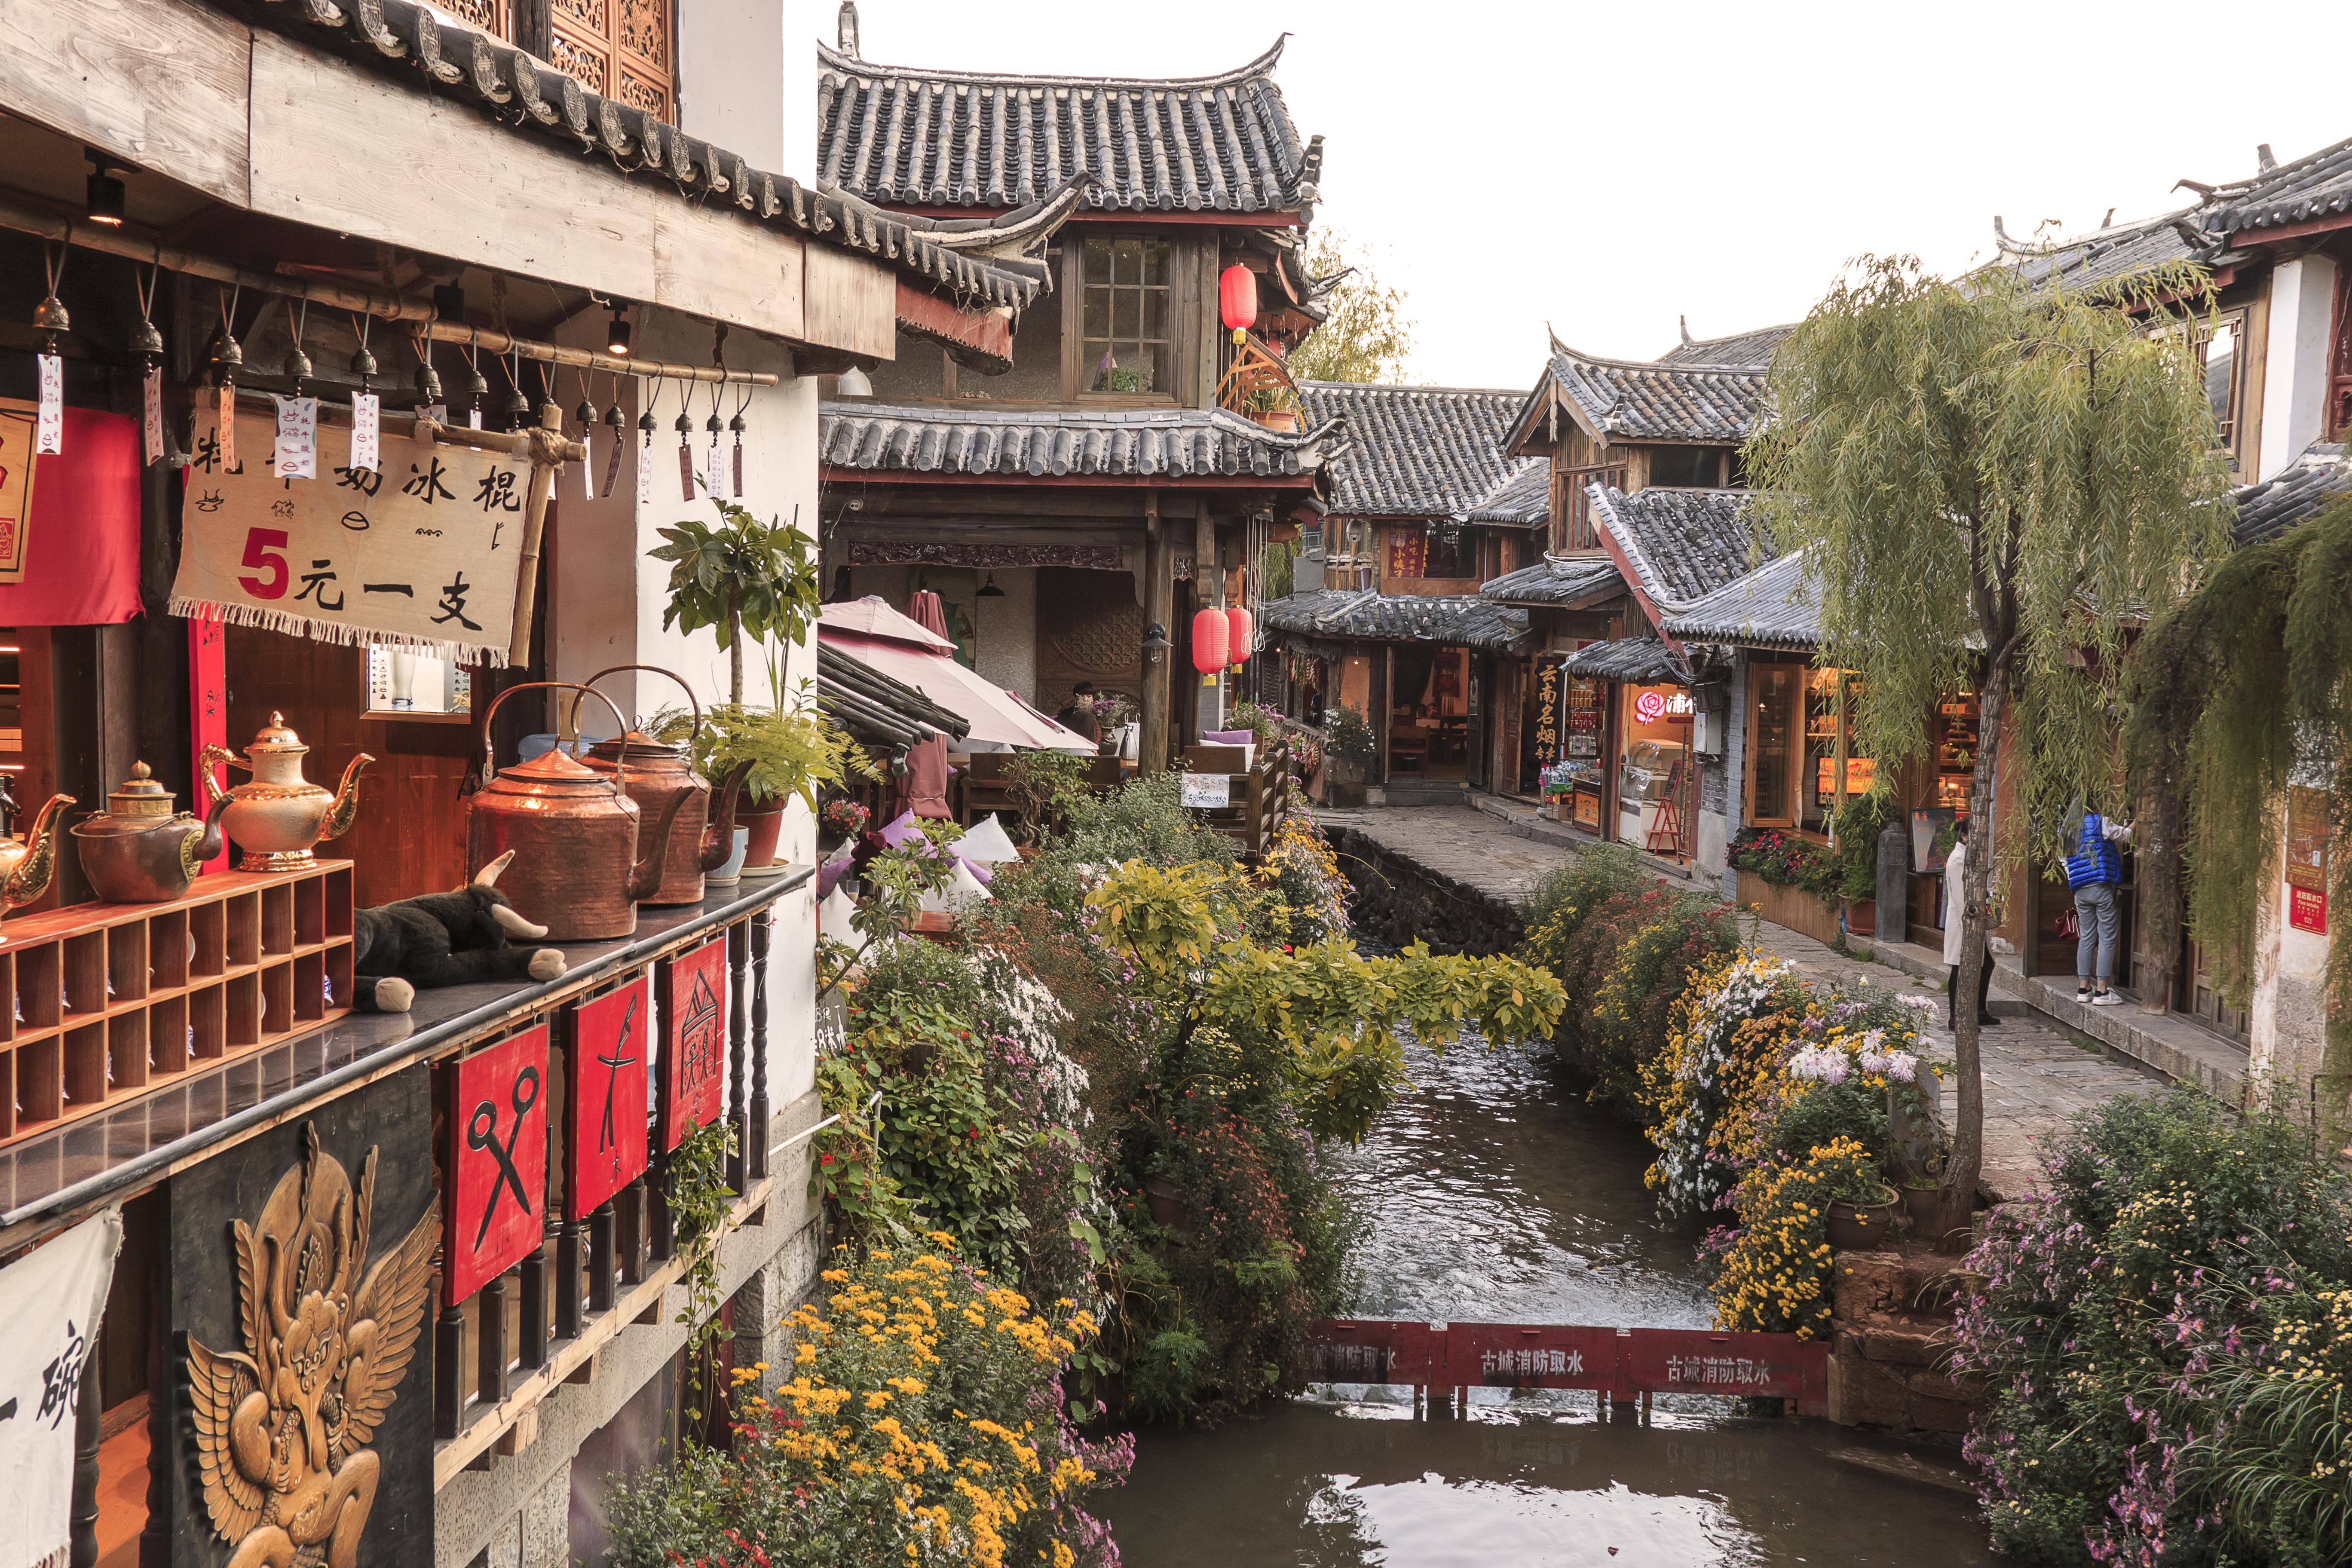 <p><strong>Лицзян, Китай</strong></p>